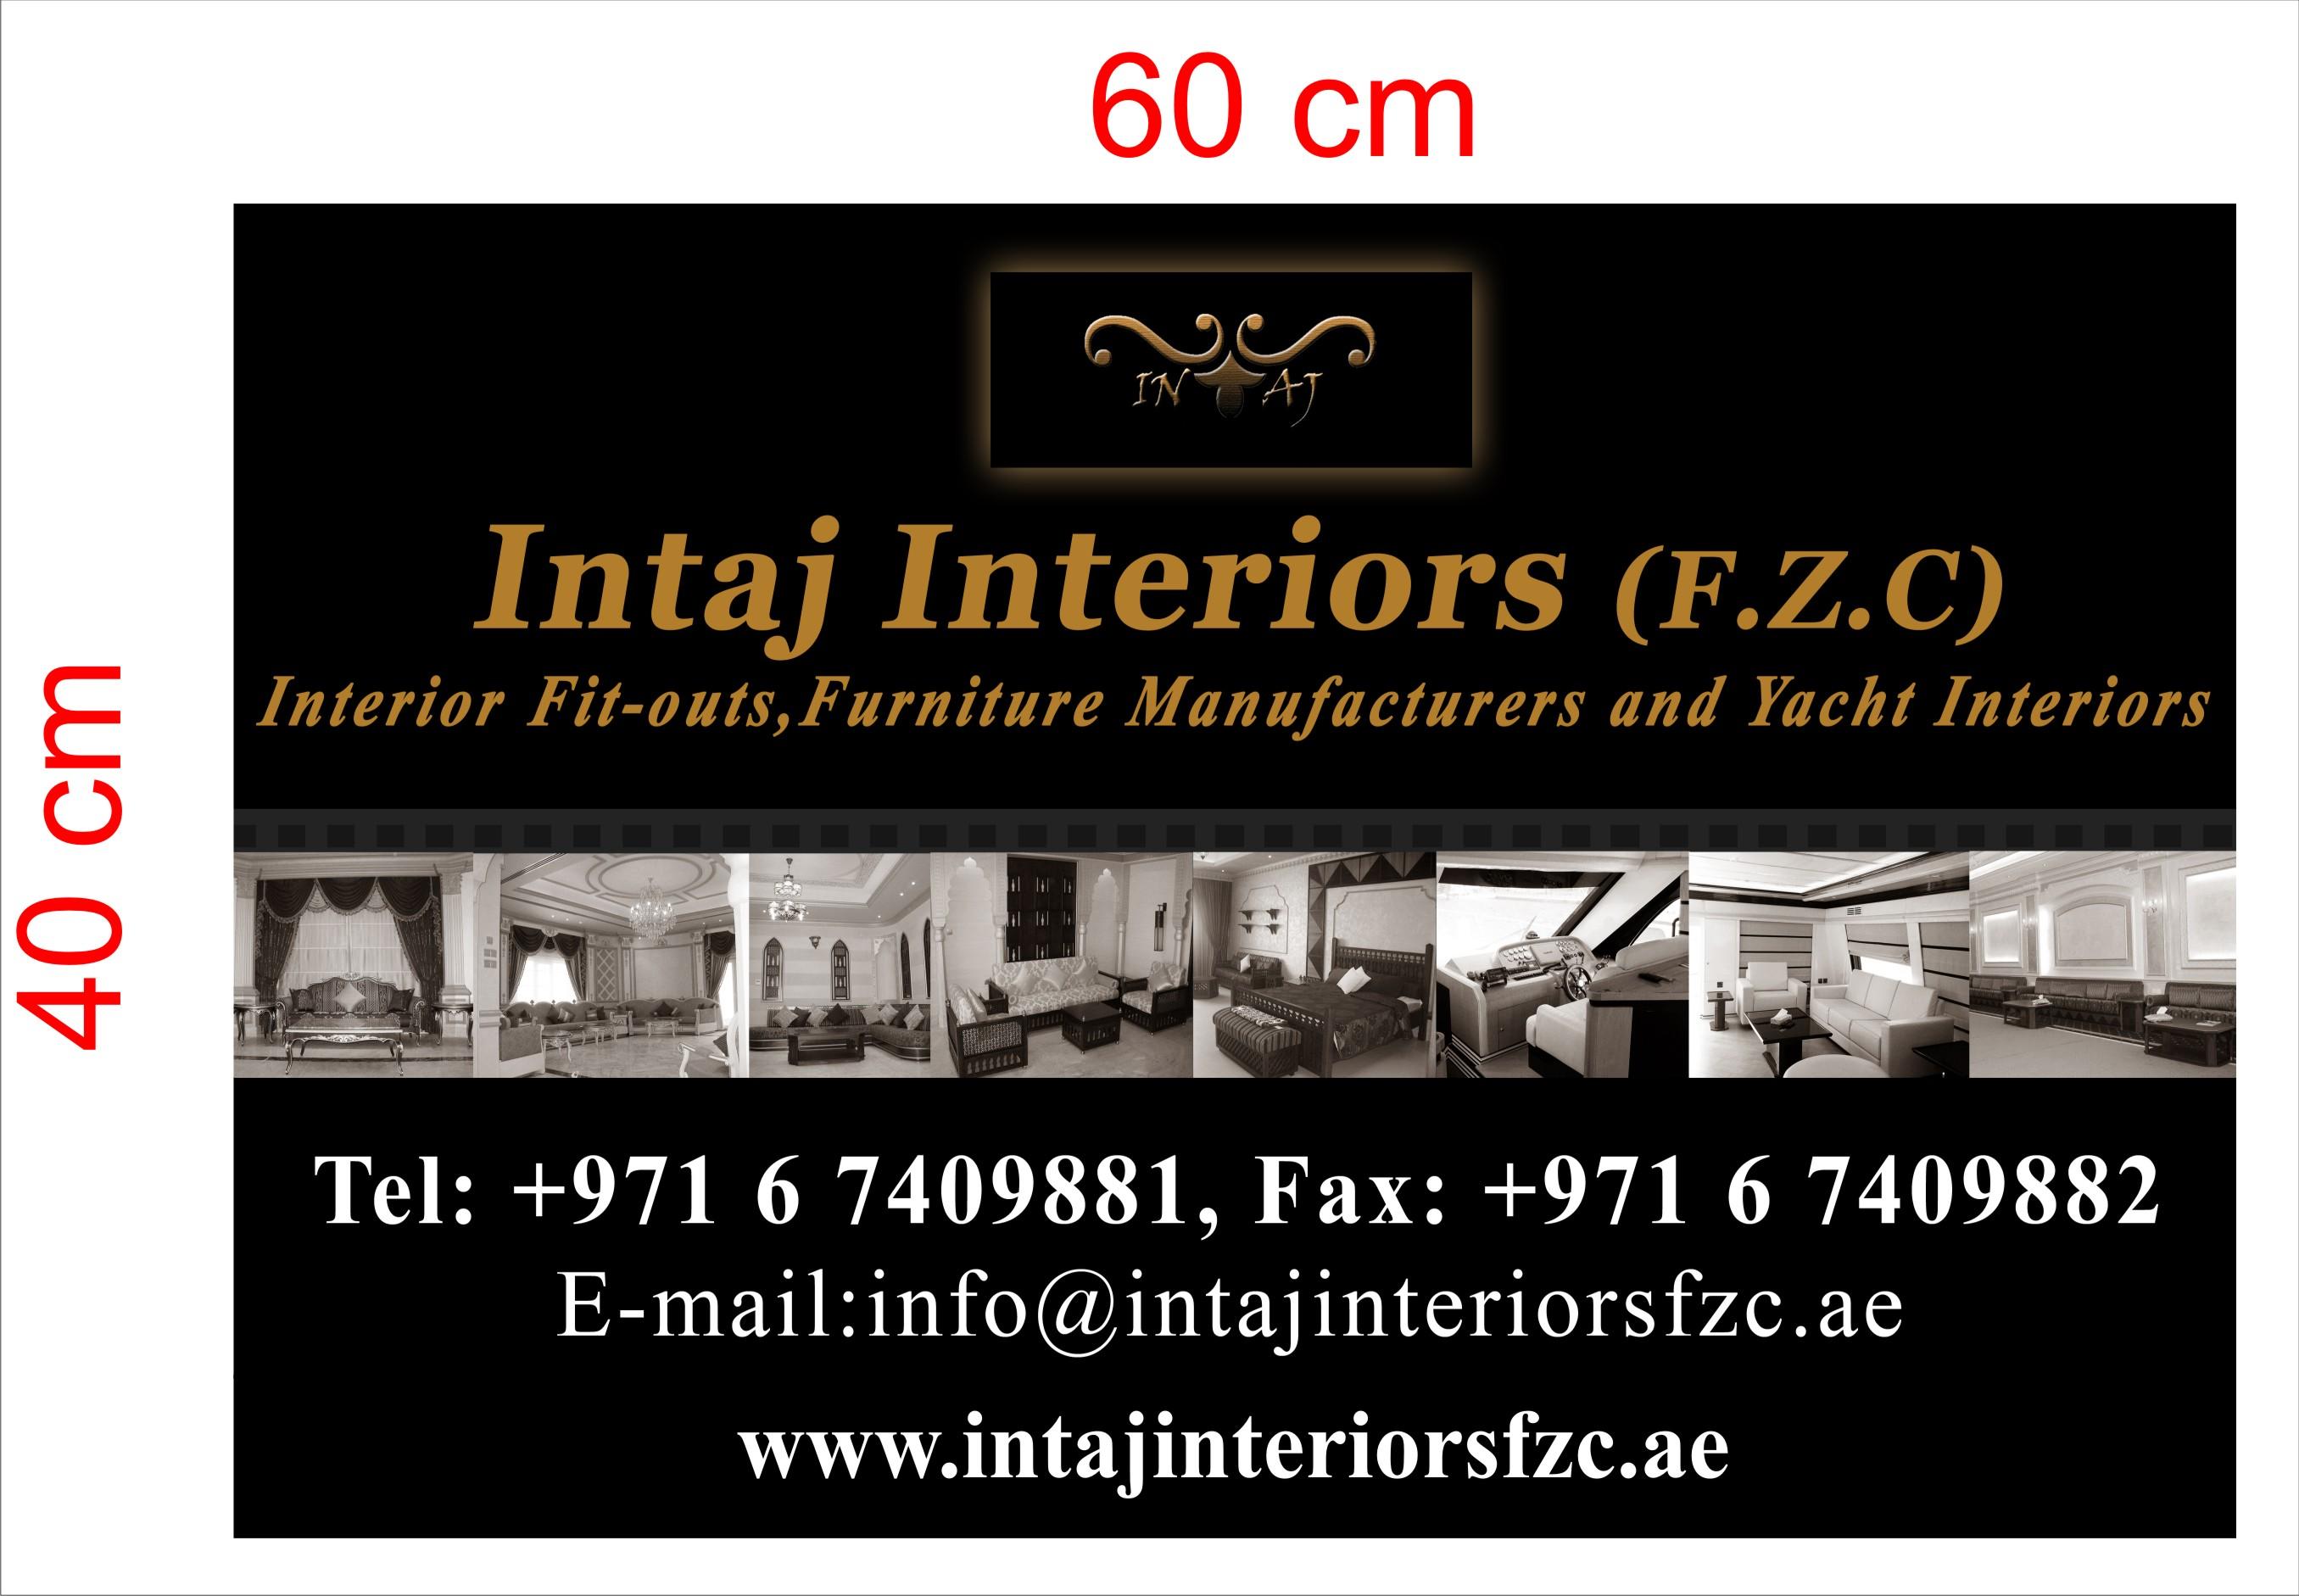 Intaj Interiors FZC